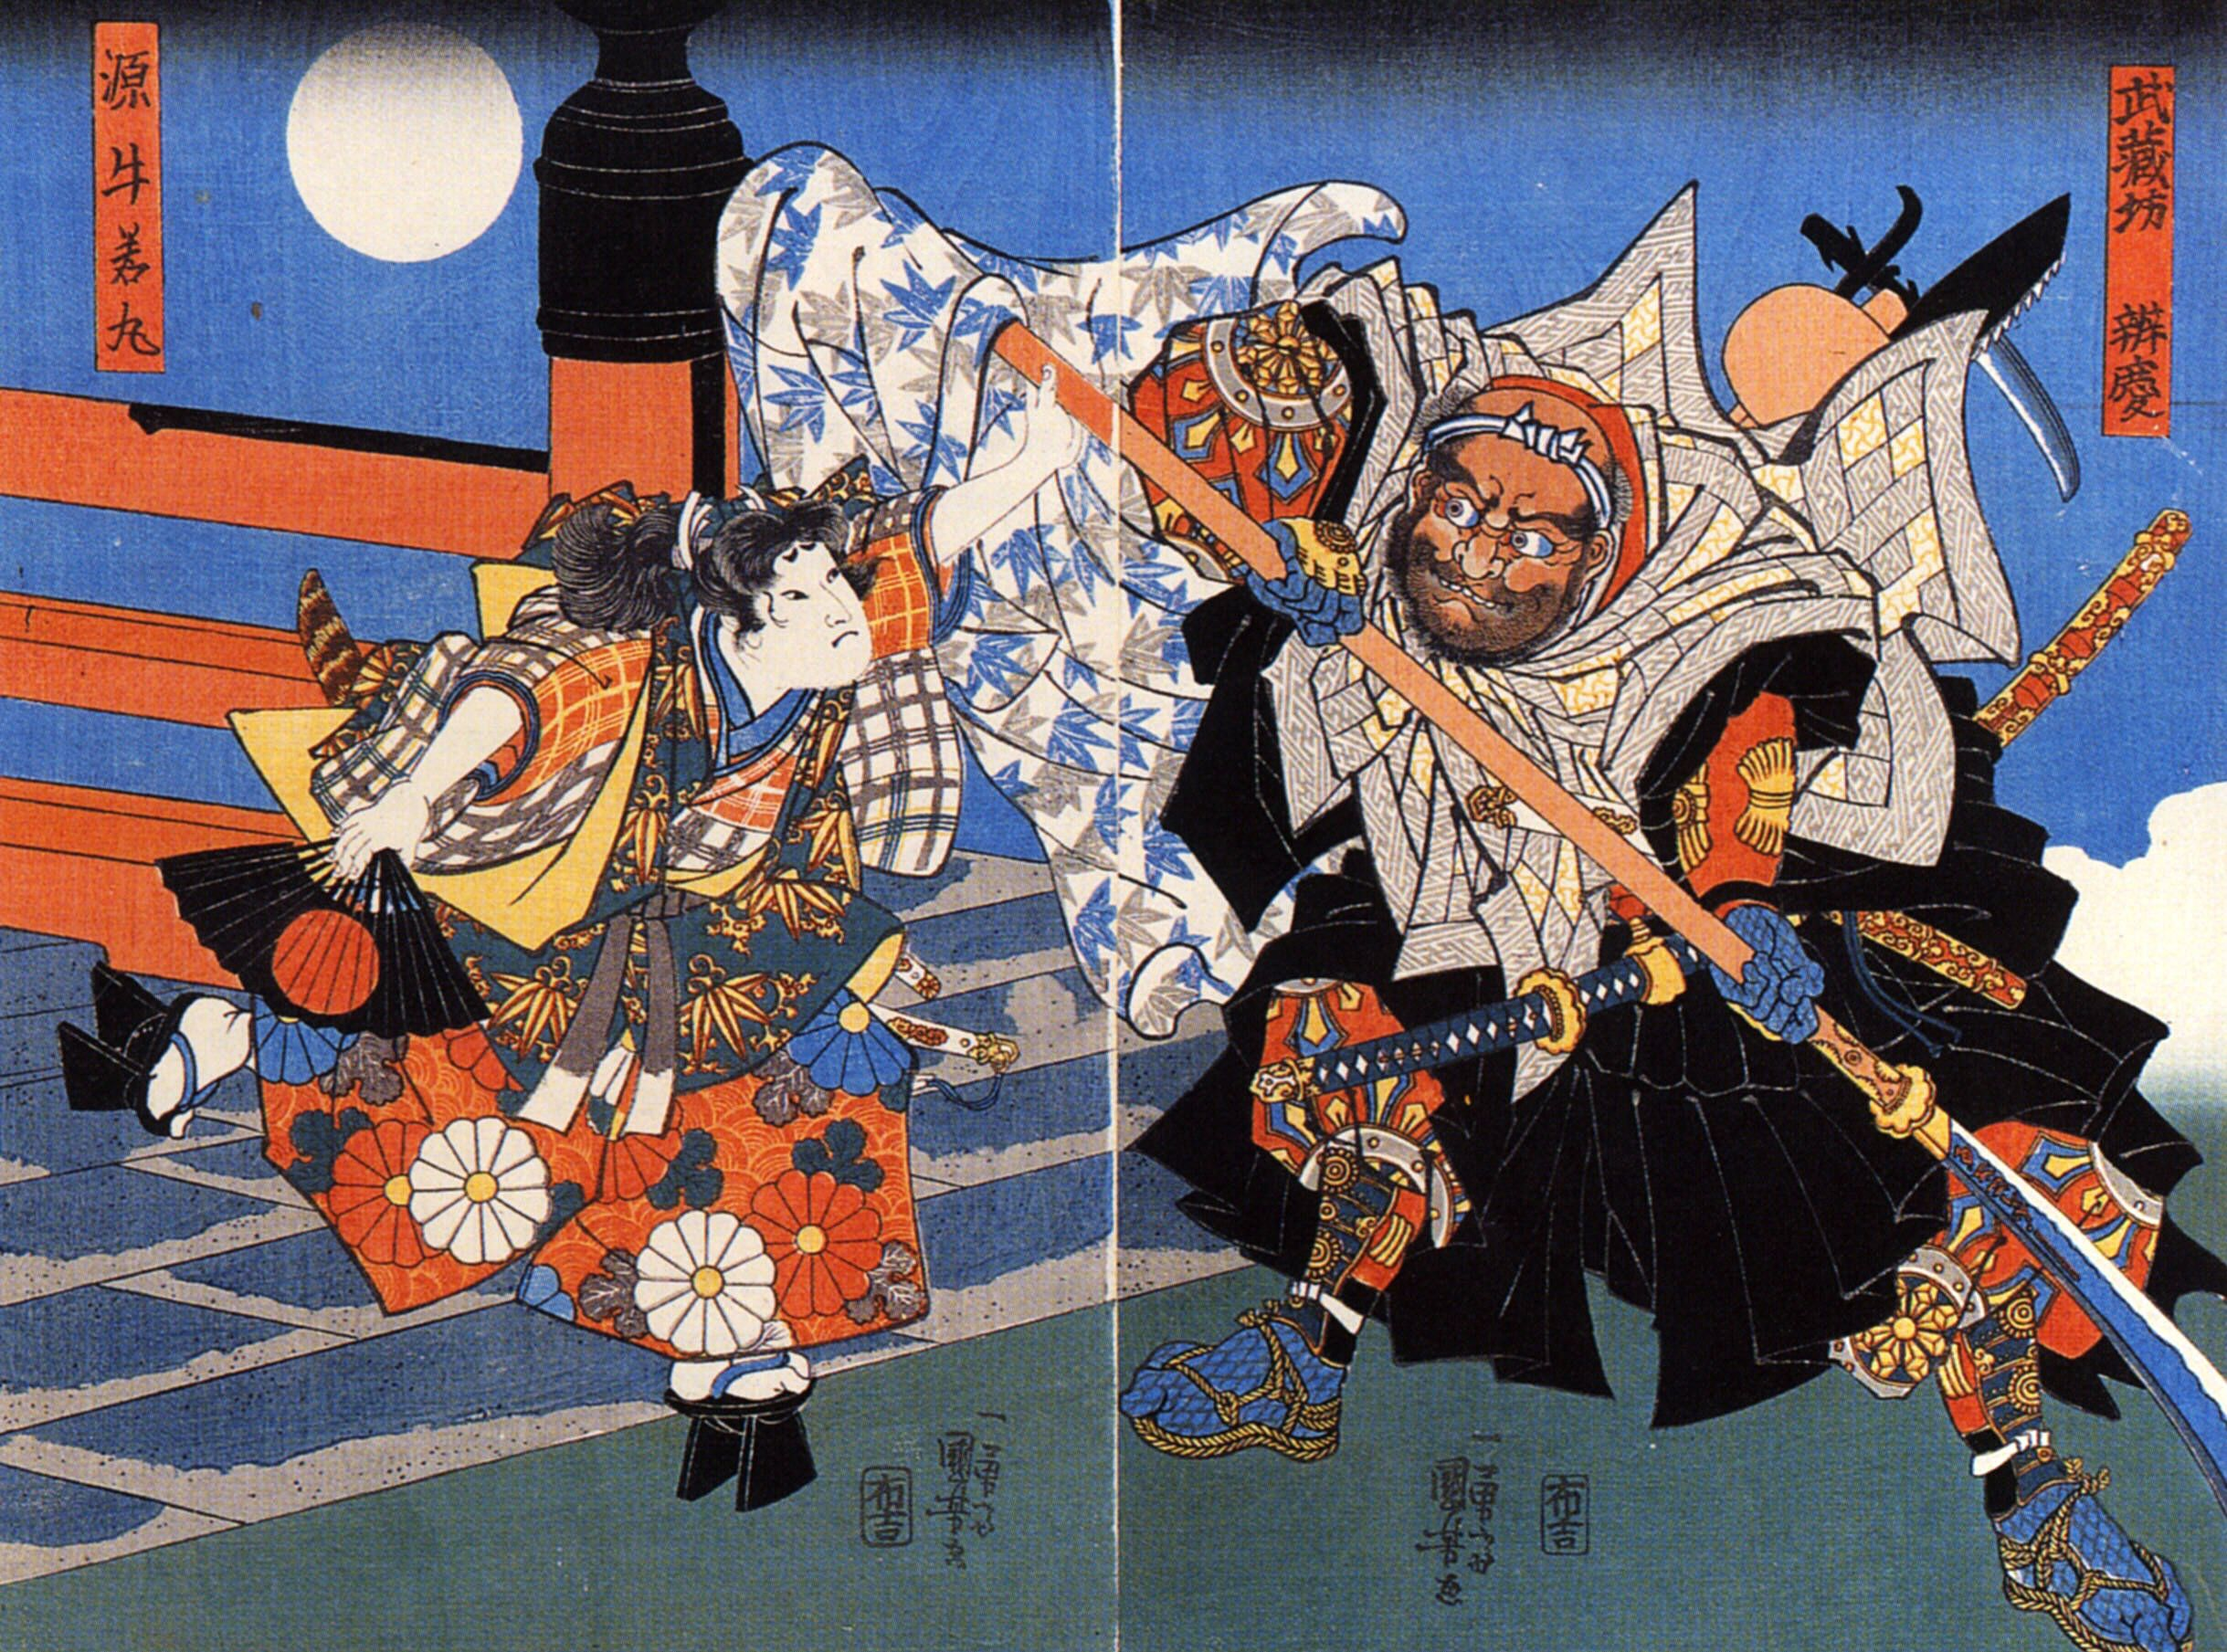 uchiwakamaru fighting benkei on gojo bridge by utagawa kuniyoshi artful for mac japanese vintage art japanese art japanese woodblock printing